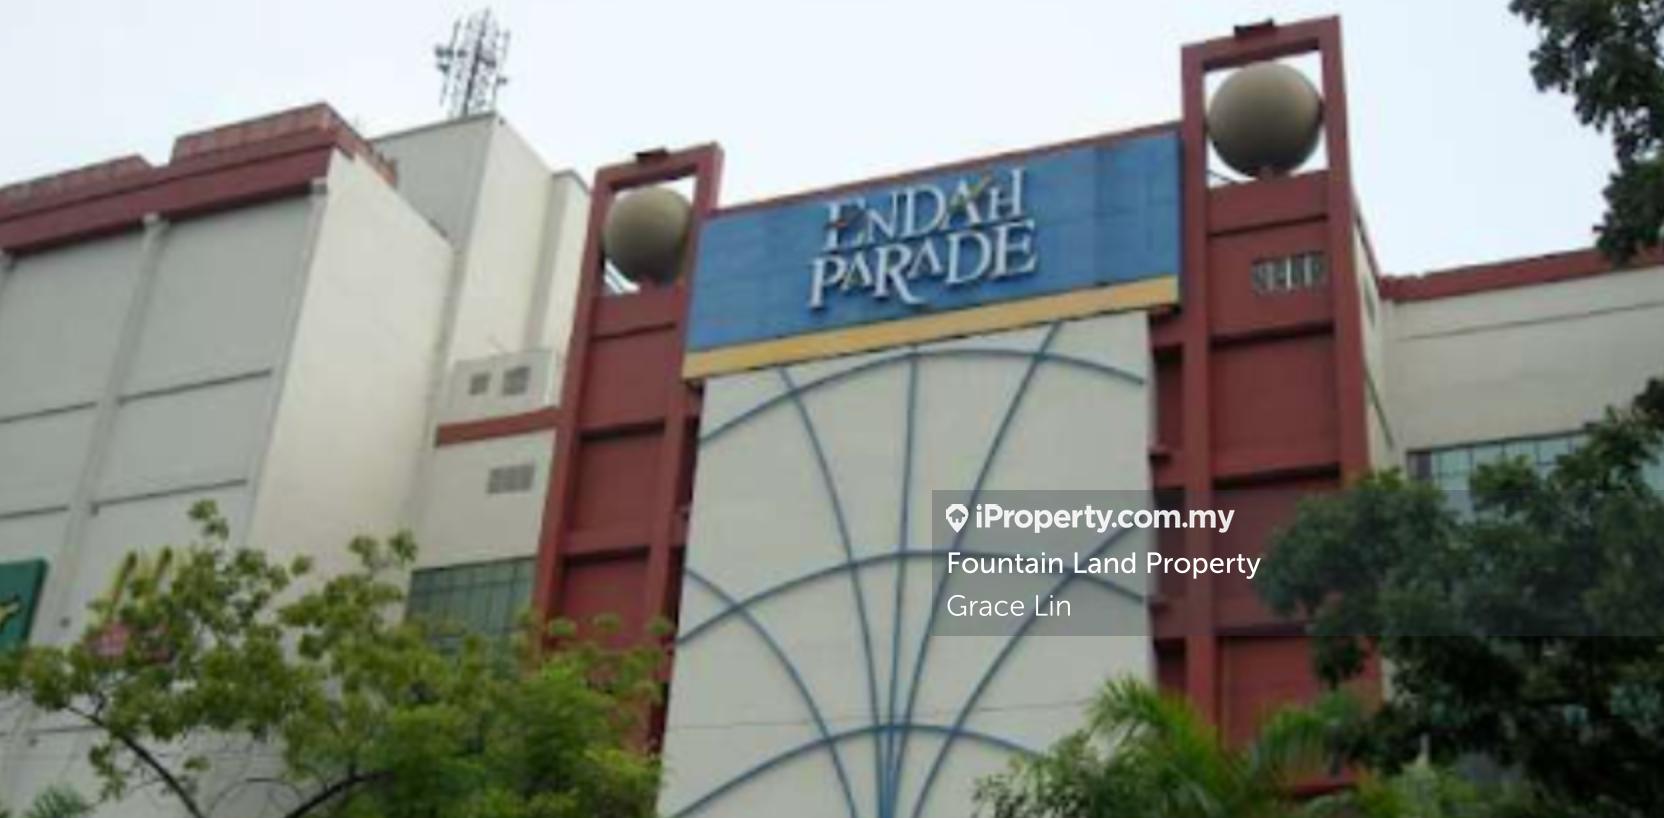 Endah Parade 2nd Floor Shop ( Near Lift and Escalator ) (Rental Income RM 1,200/mth), Sri Petaling, Endah Parade, Sri Petaling, Sri Petaling